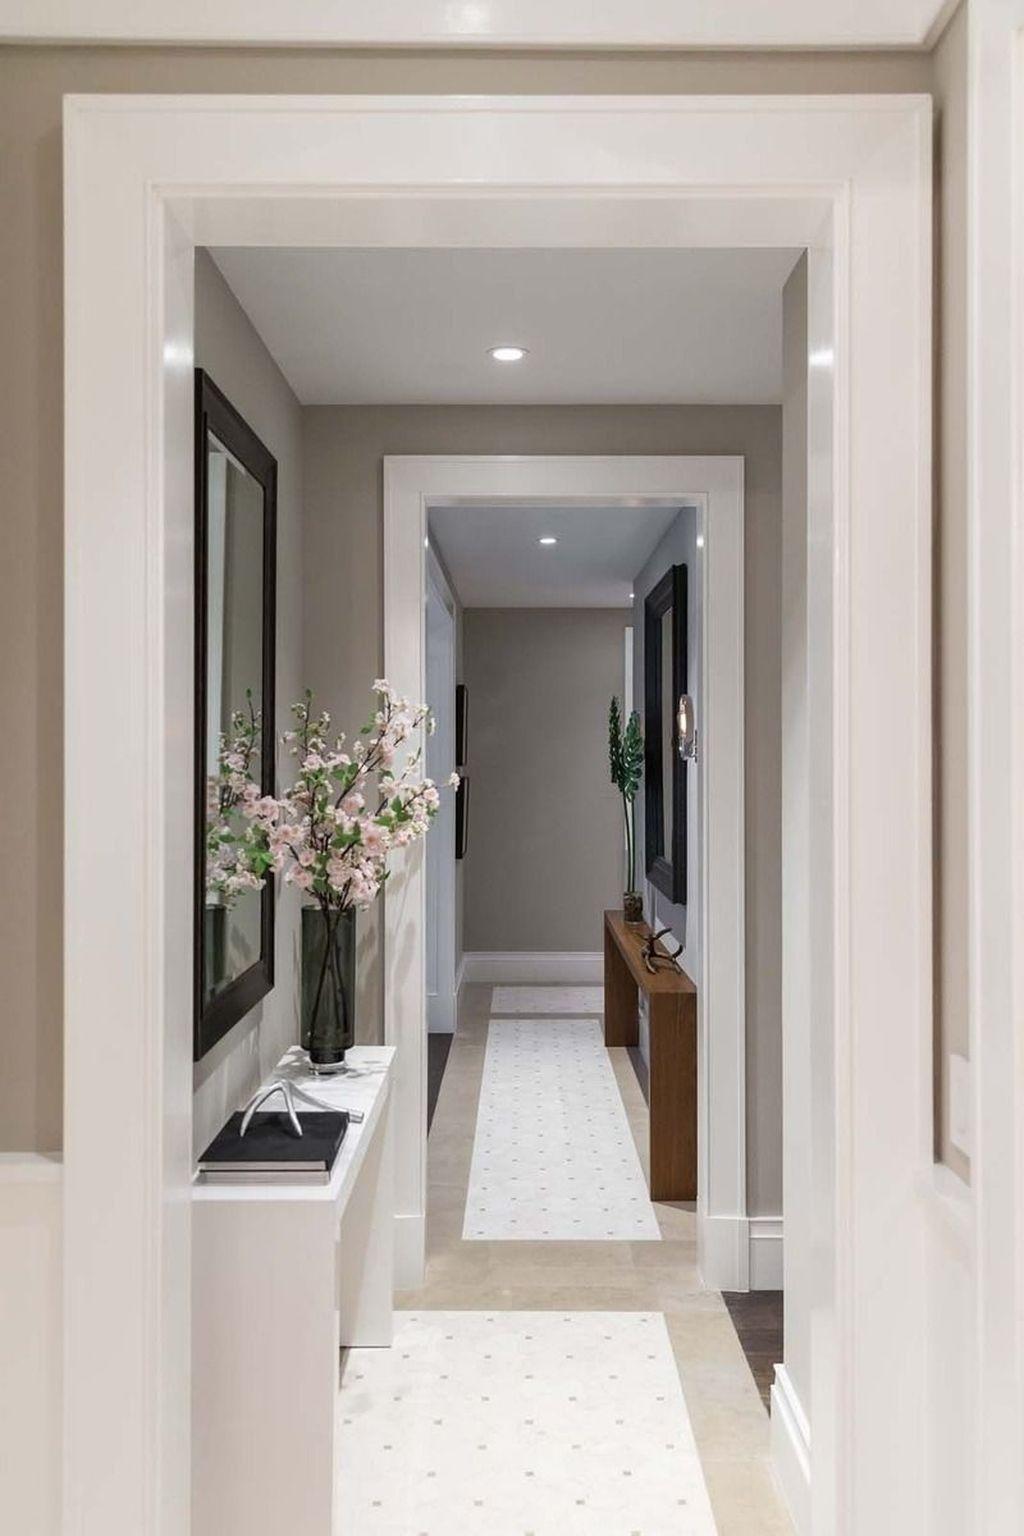 30 Astonishing Home Corridor Design For Your Home Inspiration In 2020 Hallway Designs Contemporary Hallway Narrow Hallway Decorating